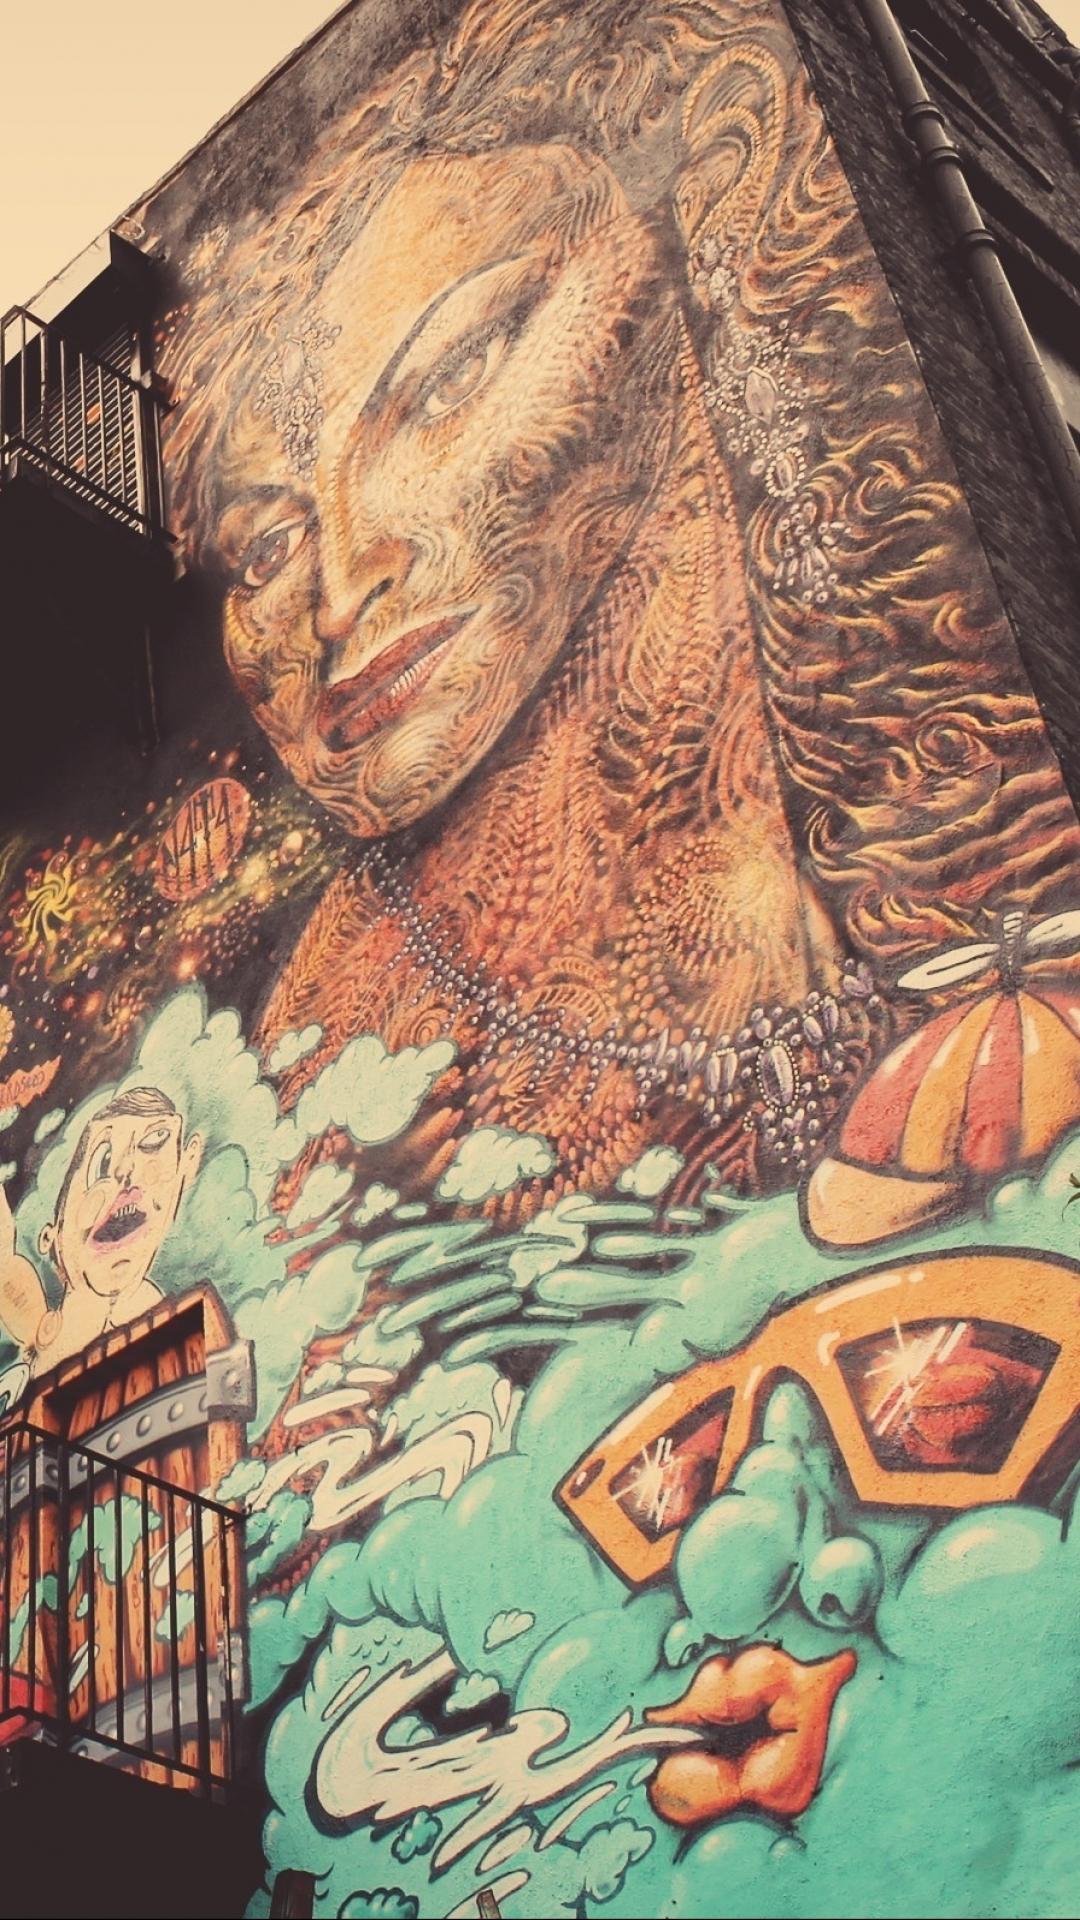 Graffiti art wallpaper iphone - Wallpaper 487904